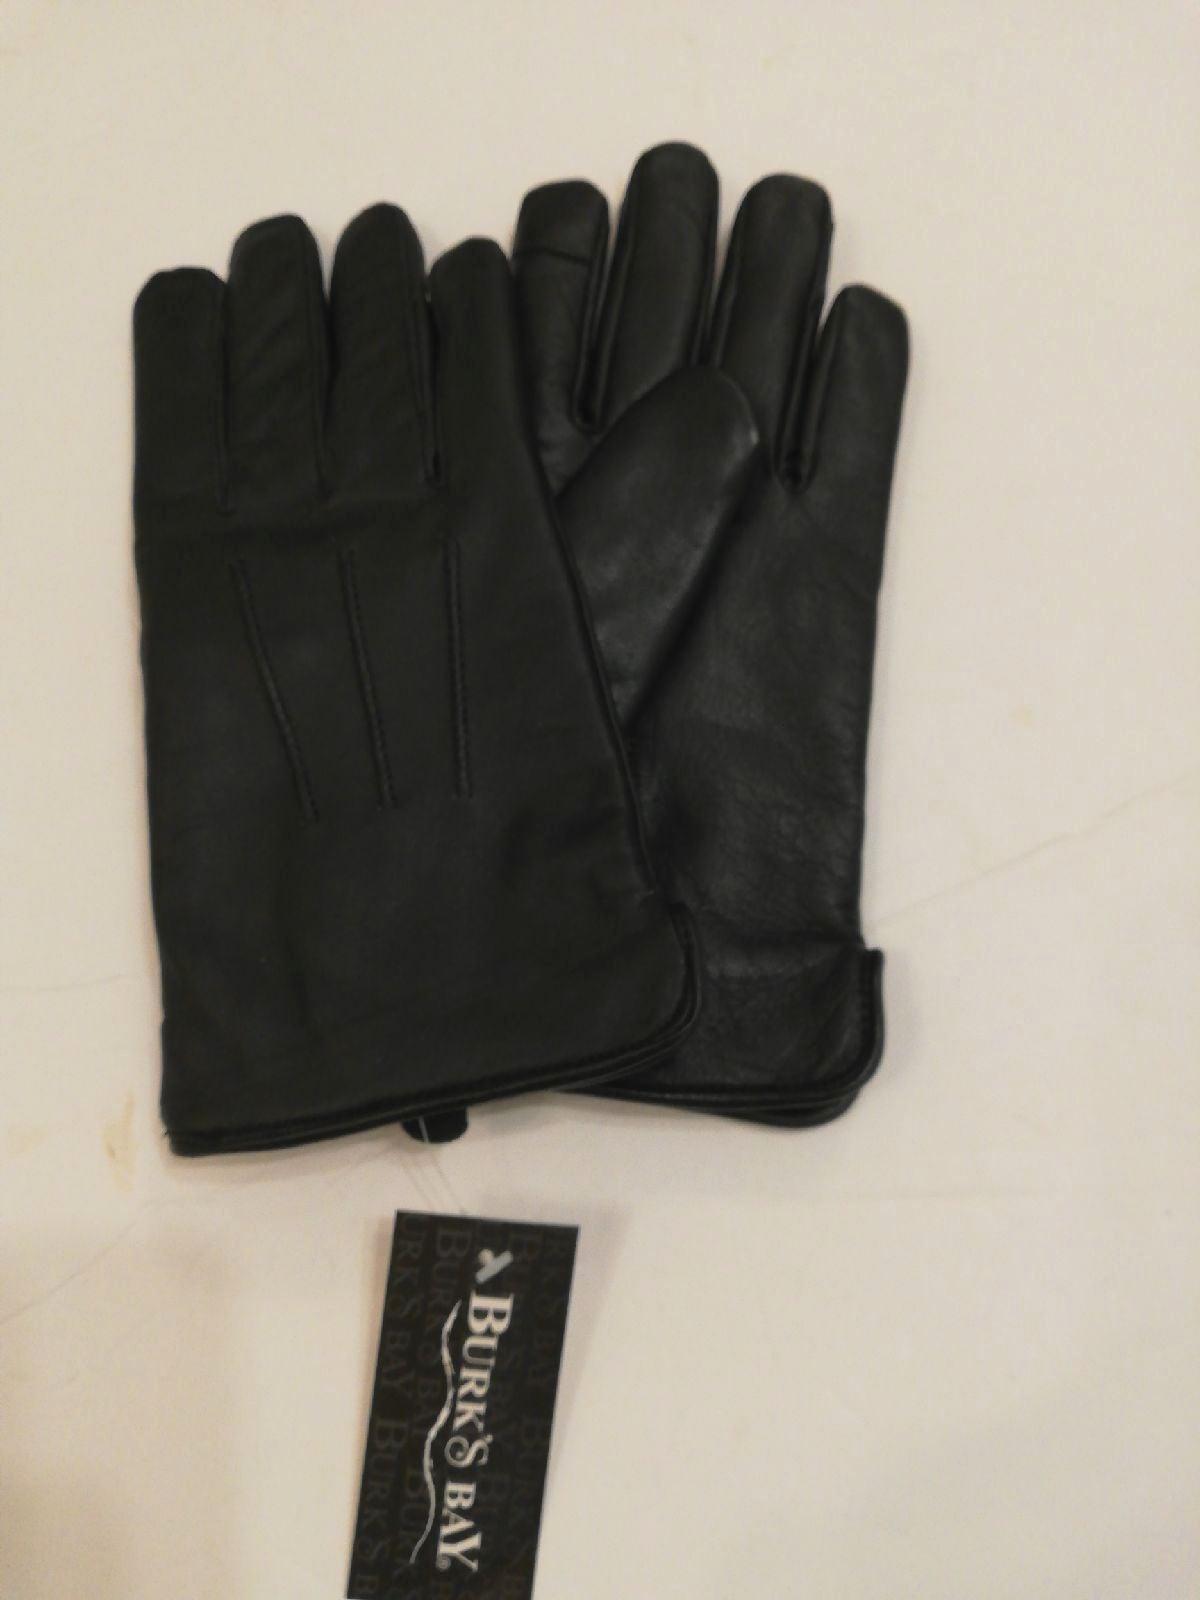 Leather Gloves, men's medium 8 1/2